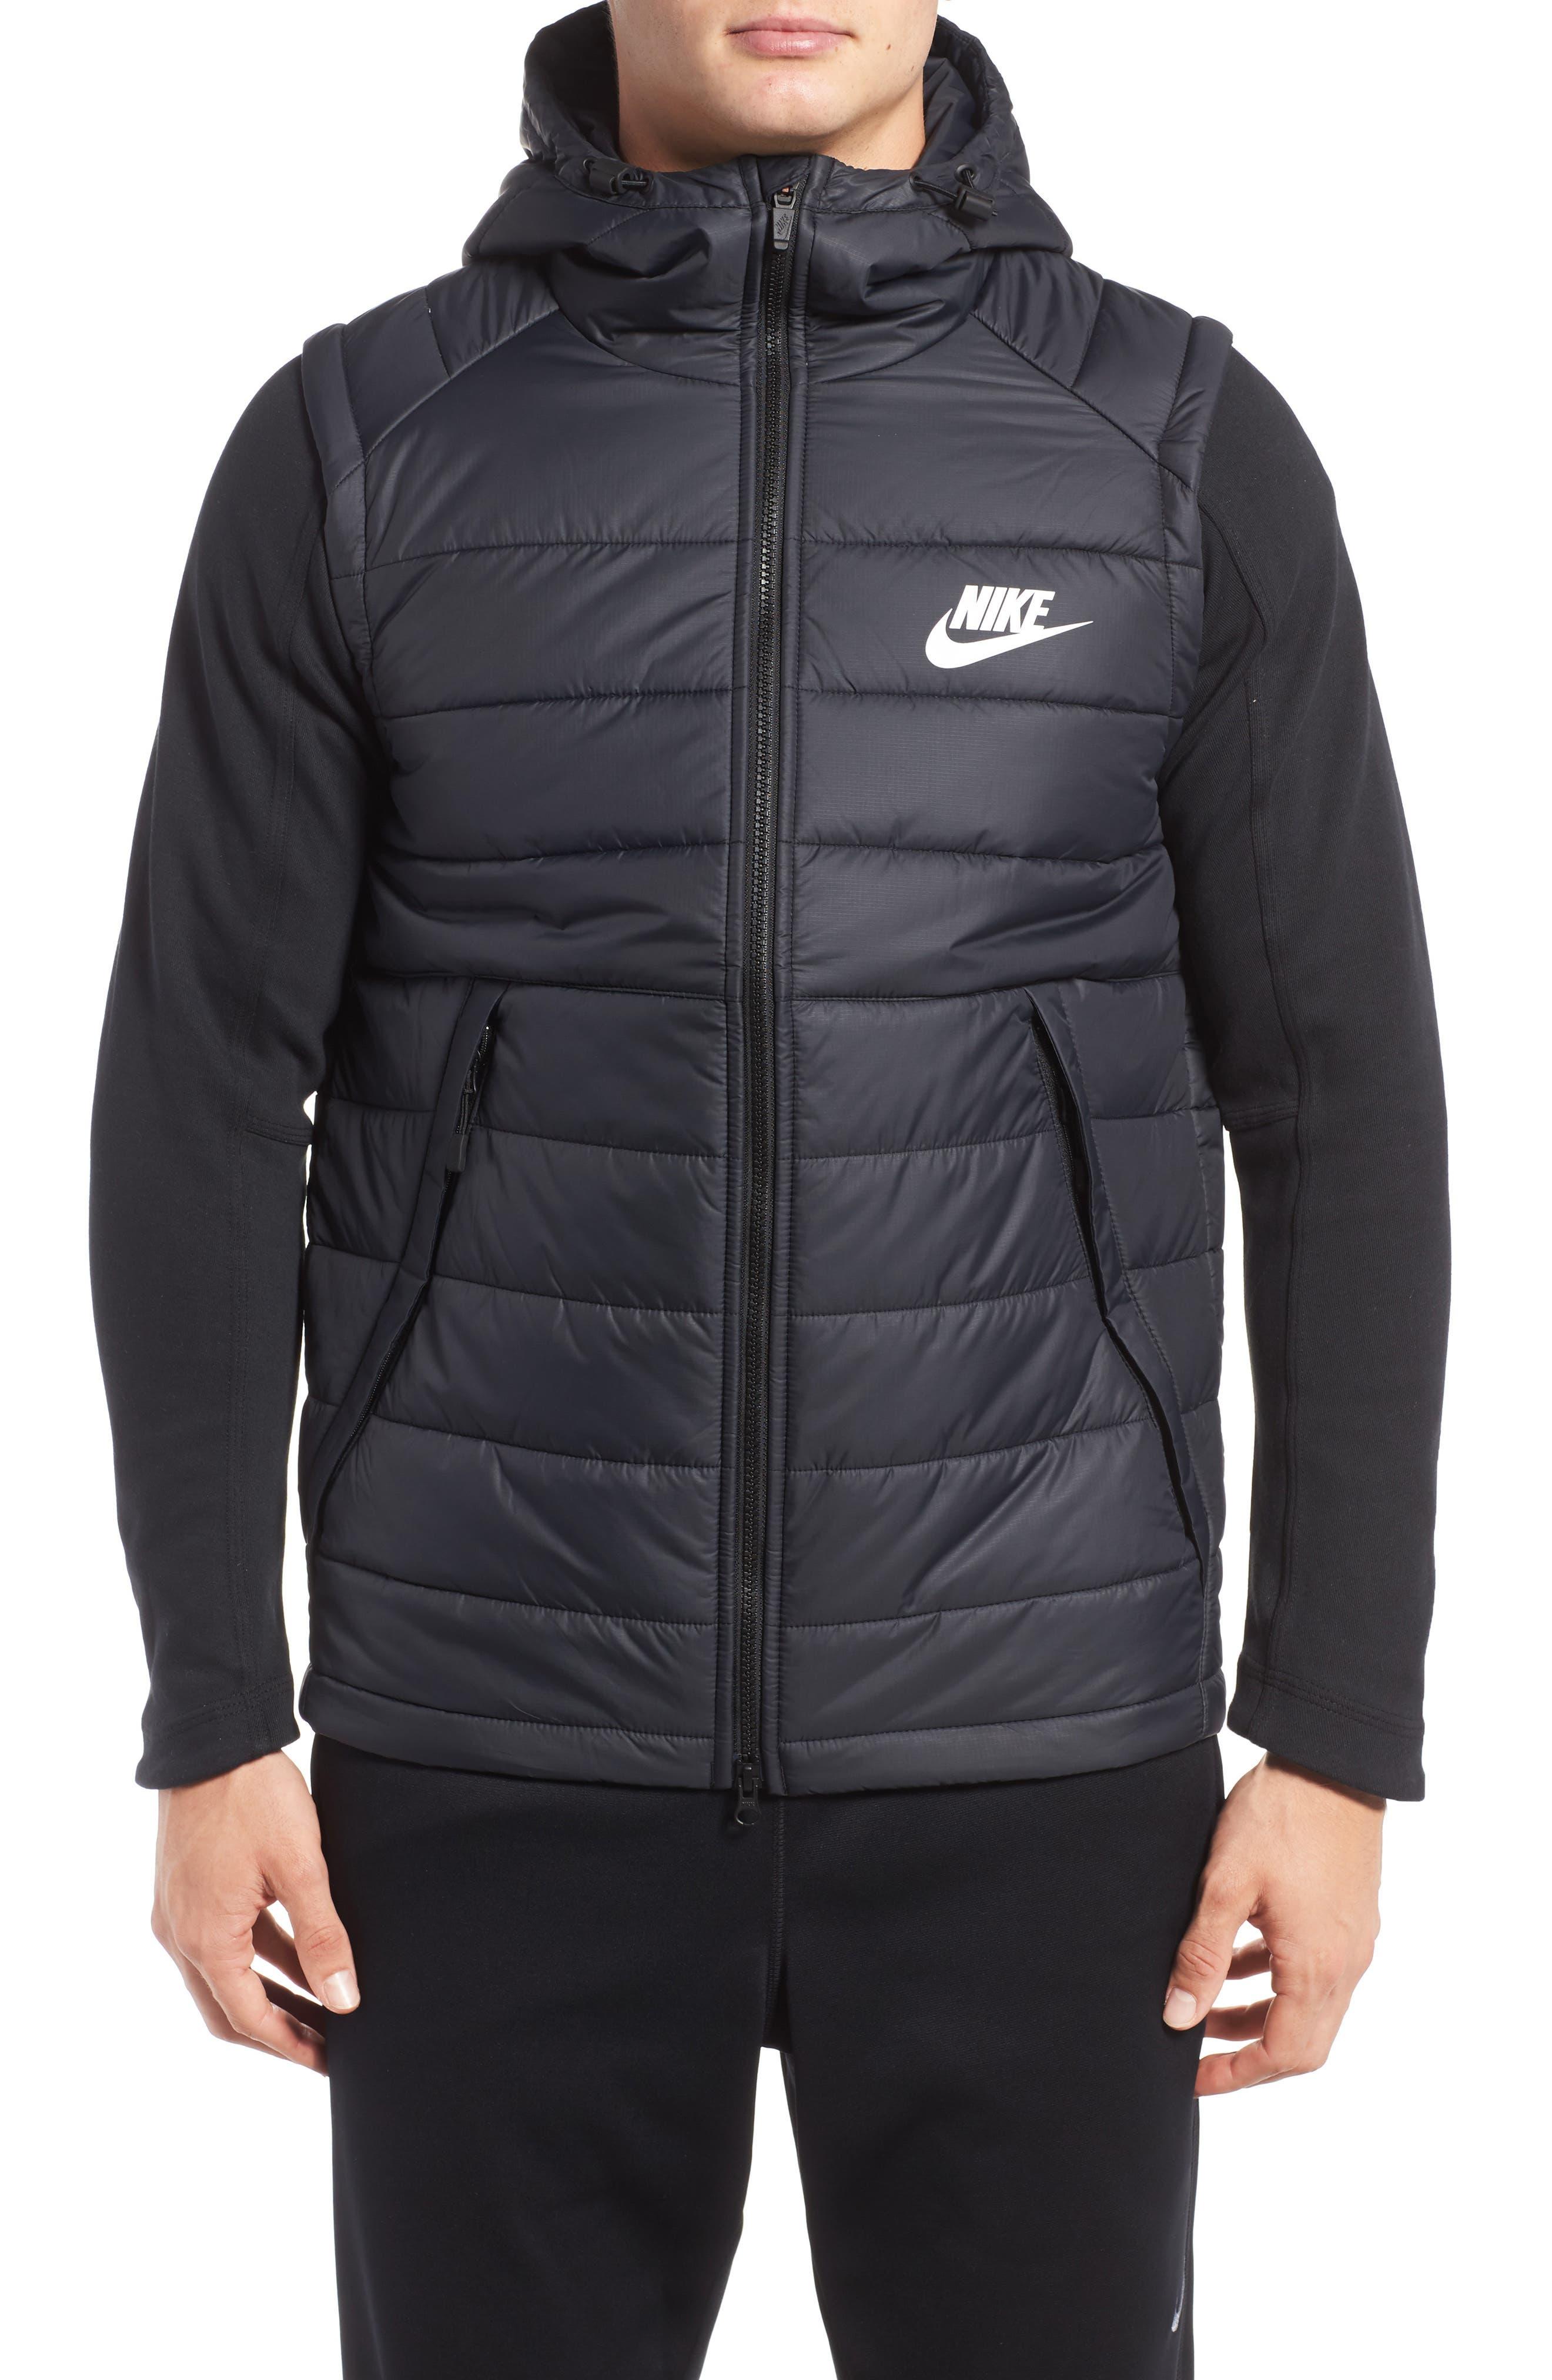 NIKE,                             Sportswear Advance 15 Jacket,                             Main thumbnail 1, color,                             010